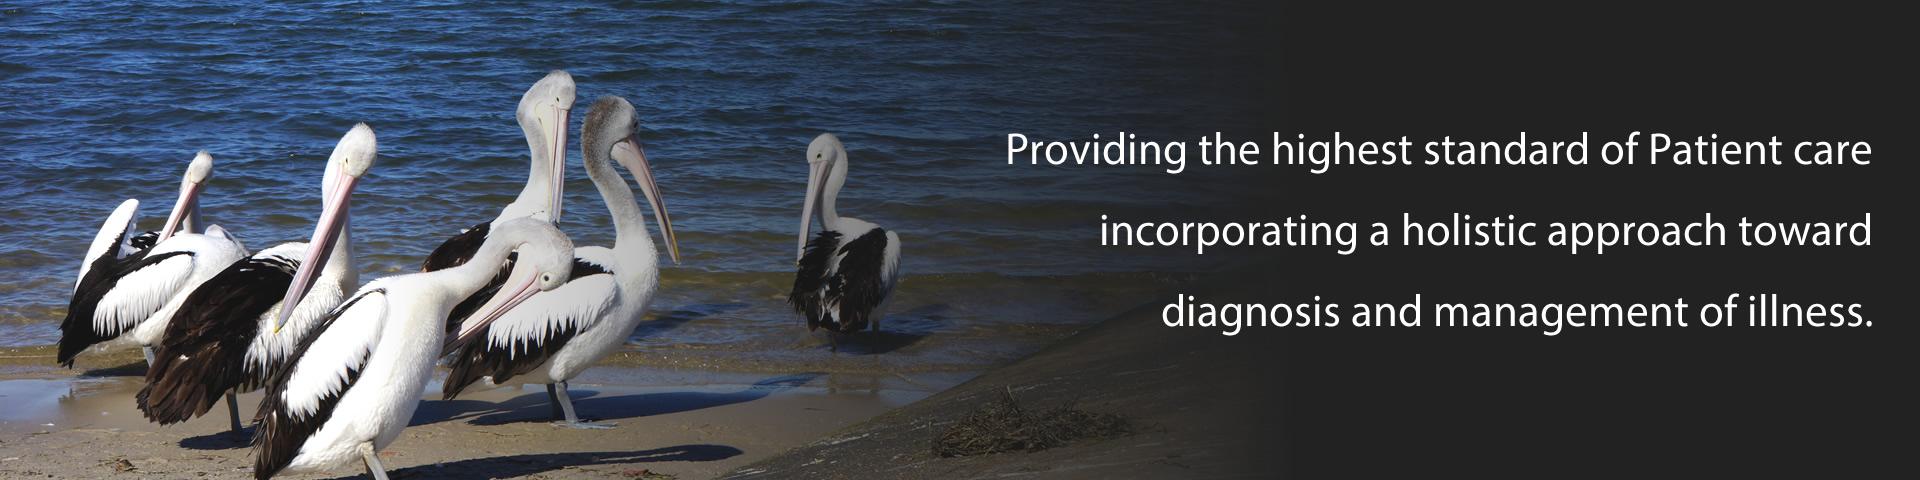 Slider Pelicans